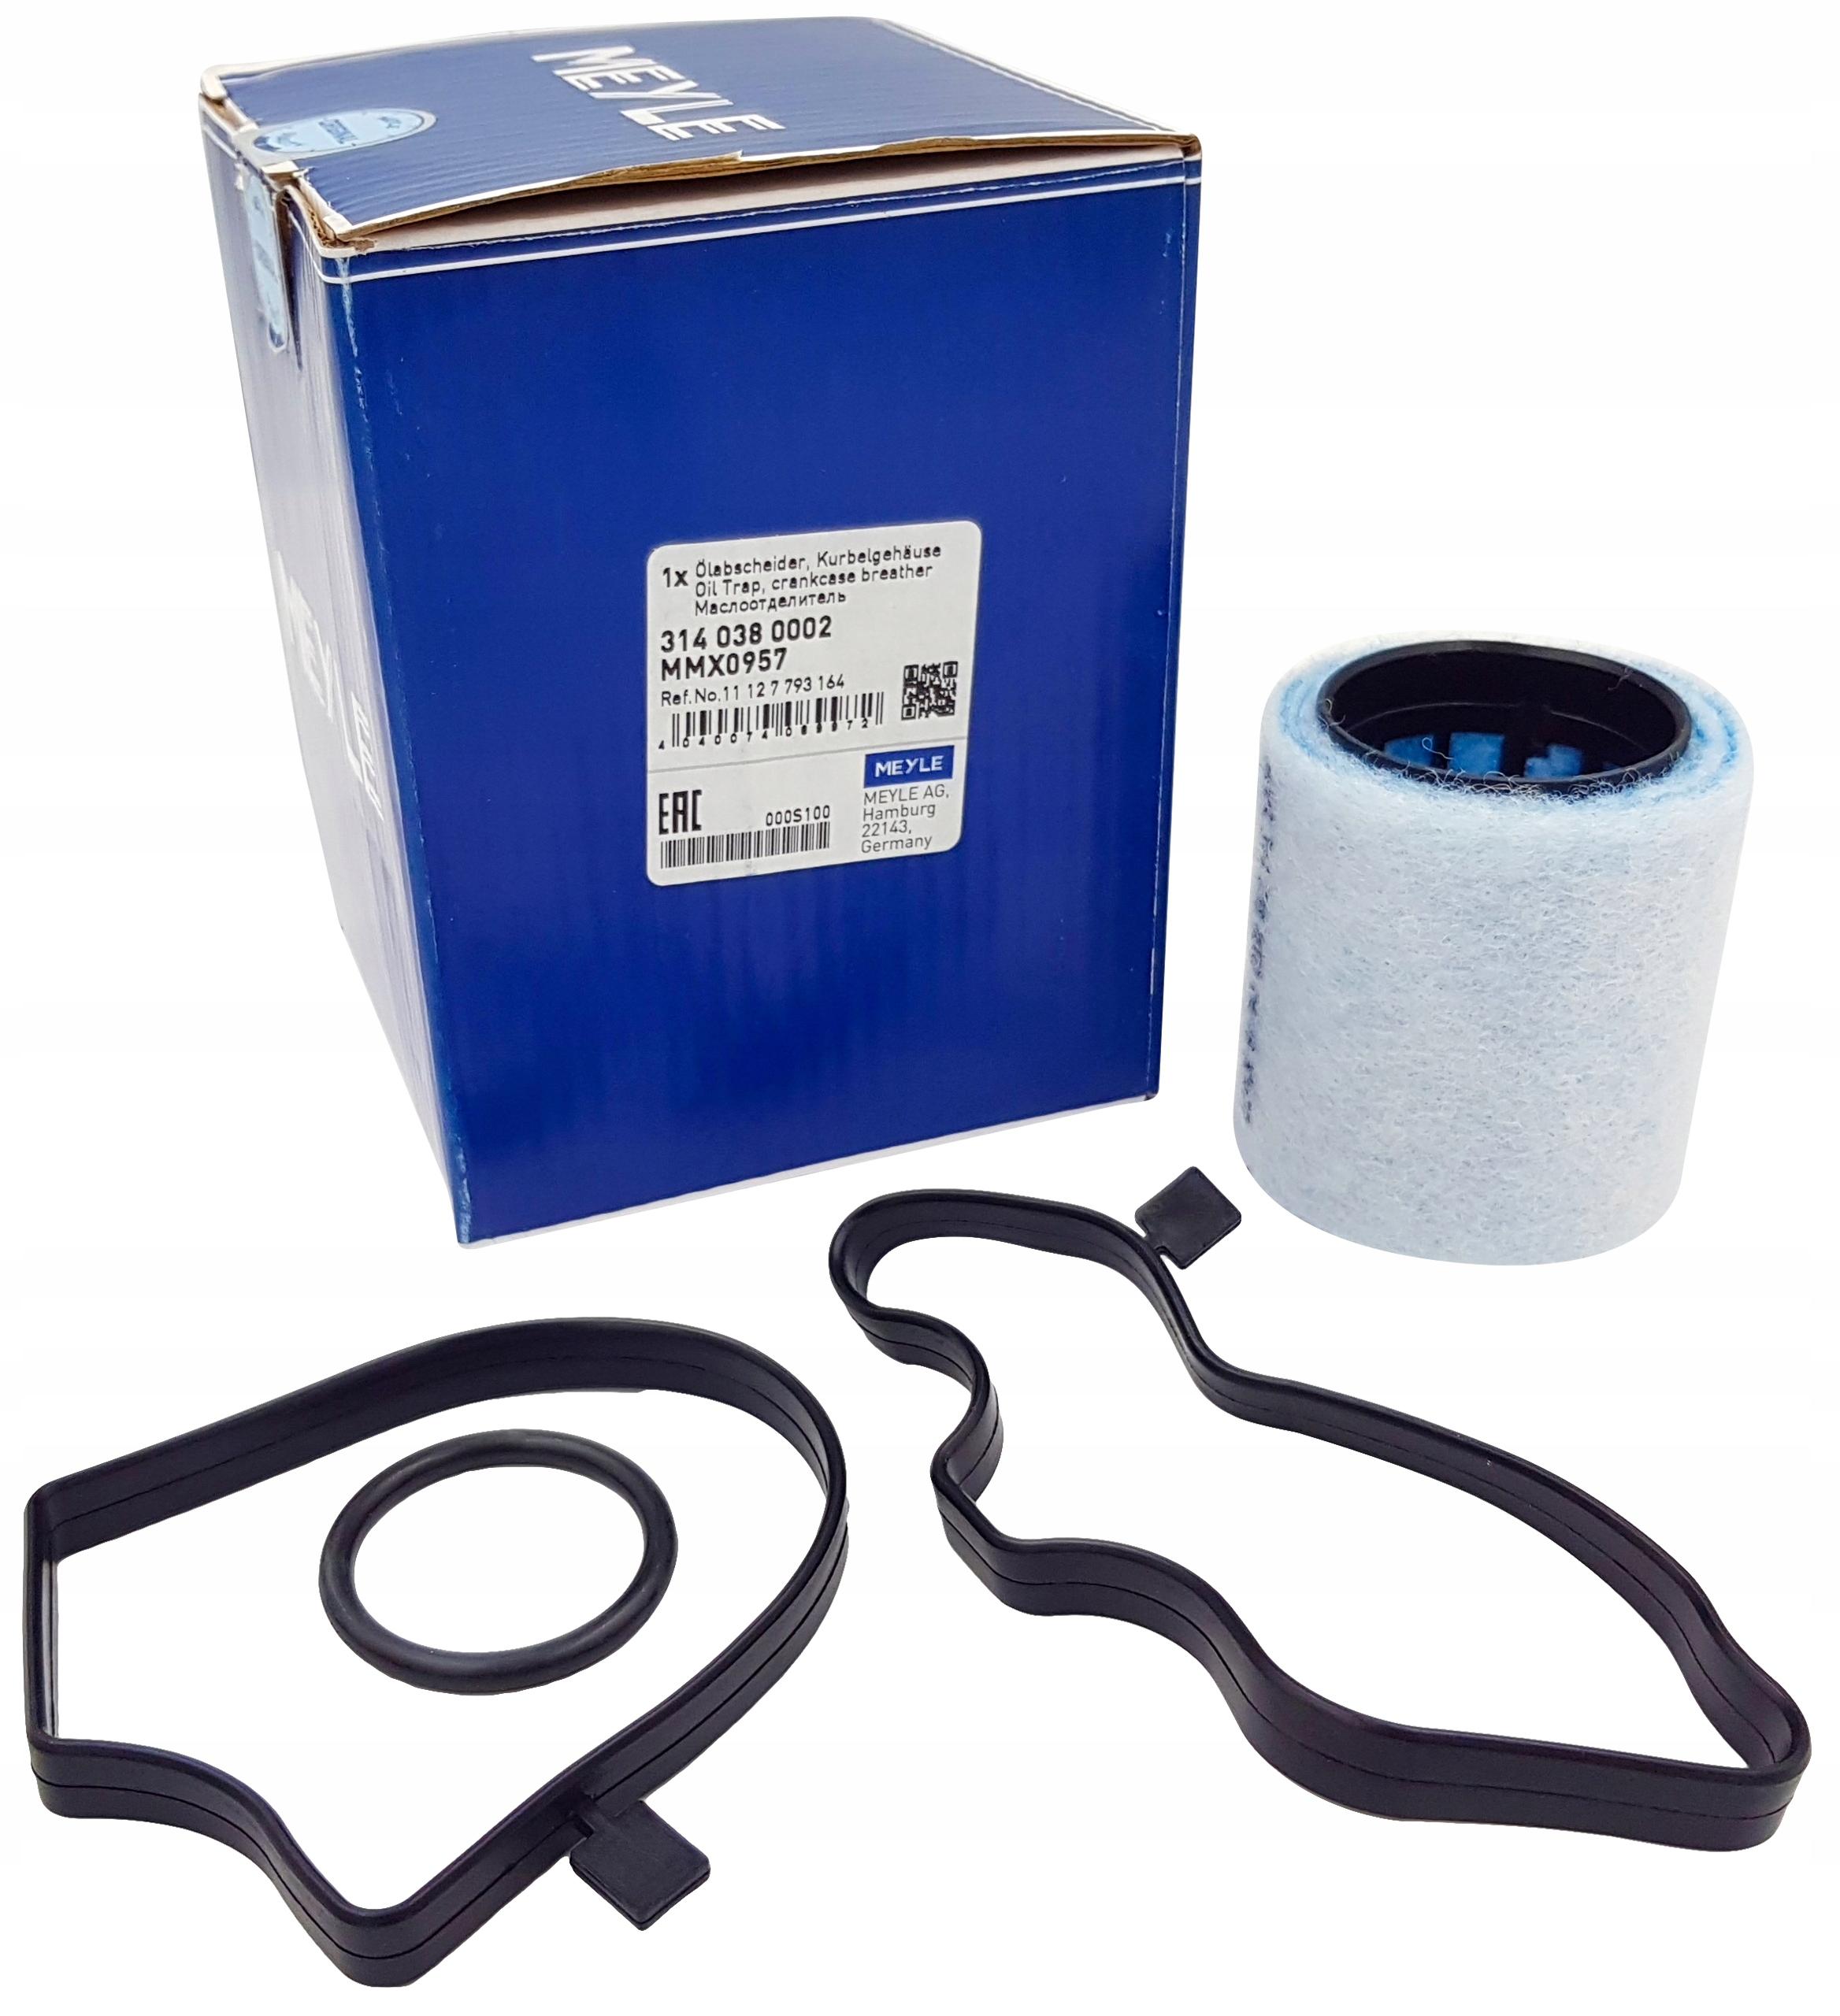 фильтр odmy сепаратор масла к bmw e39 e46 e53 30d